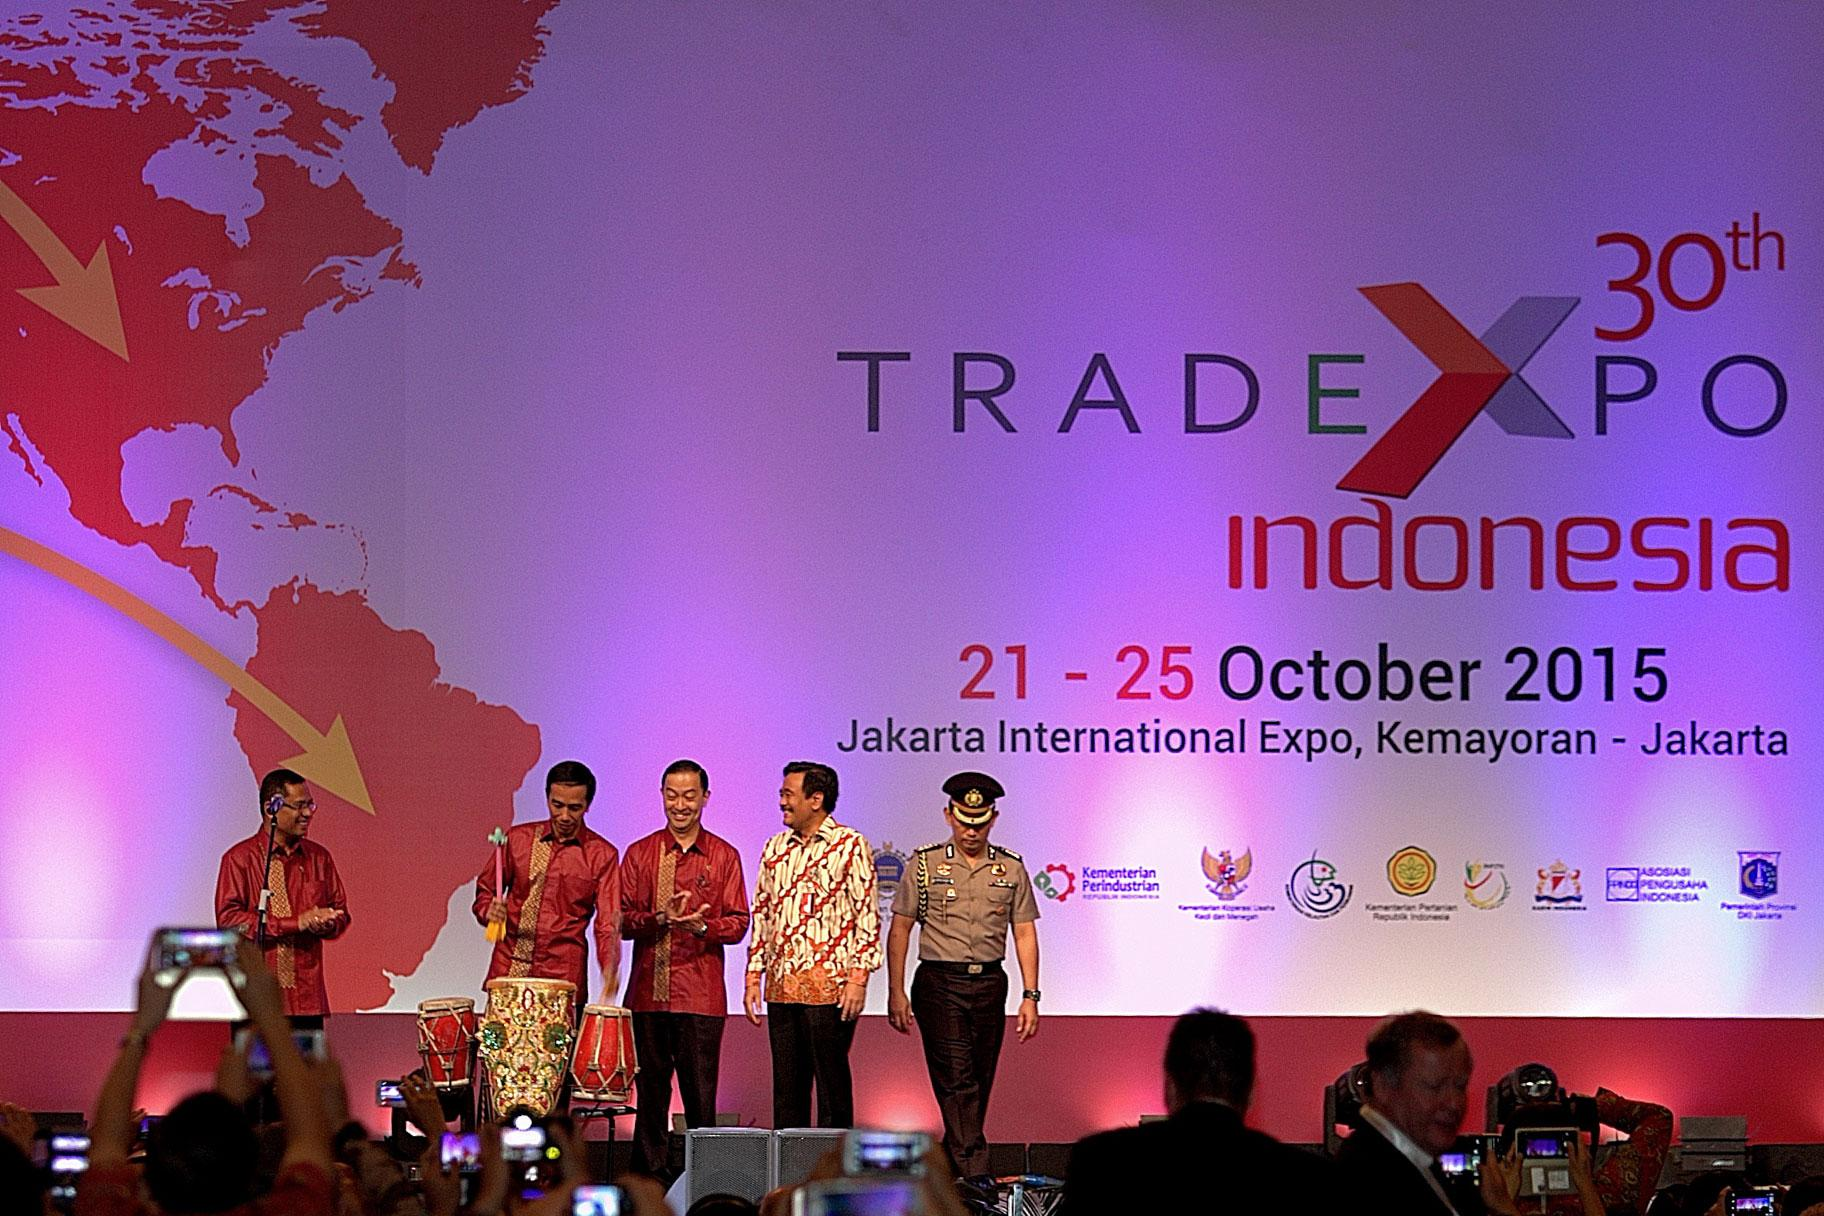 Presiden Joko Widodo (kedua kiri) didampingi Menteri Perdagangan Thomas Lembong,mMenteri Perindustrian Saleh Husin (kiri), saat sebelum pembukaan pameran Trade Expo Indonesia ke-30 Tahun 2015 di Arena Pekan Raya Jakarta, Kemayoran, Jakarta, Rabu (21/10).